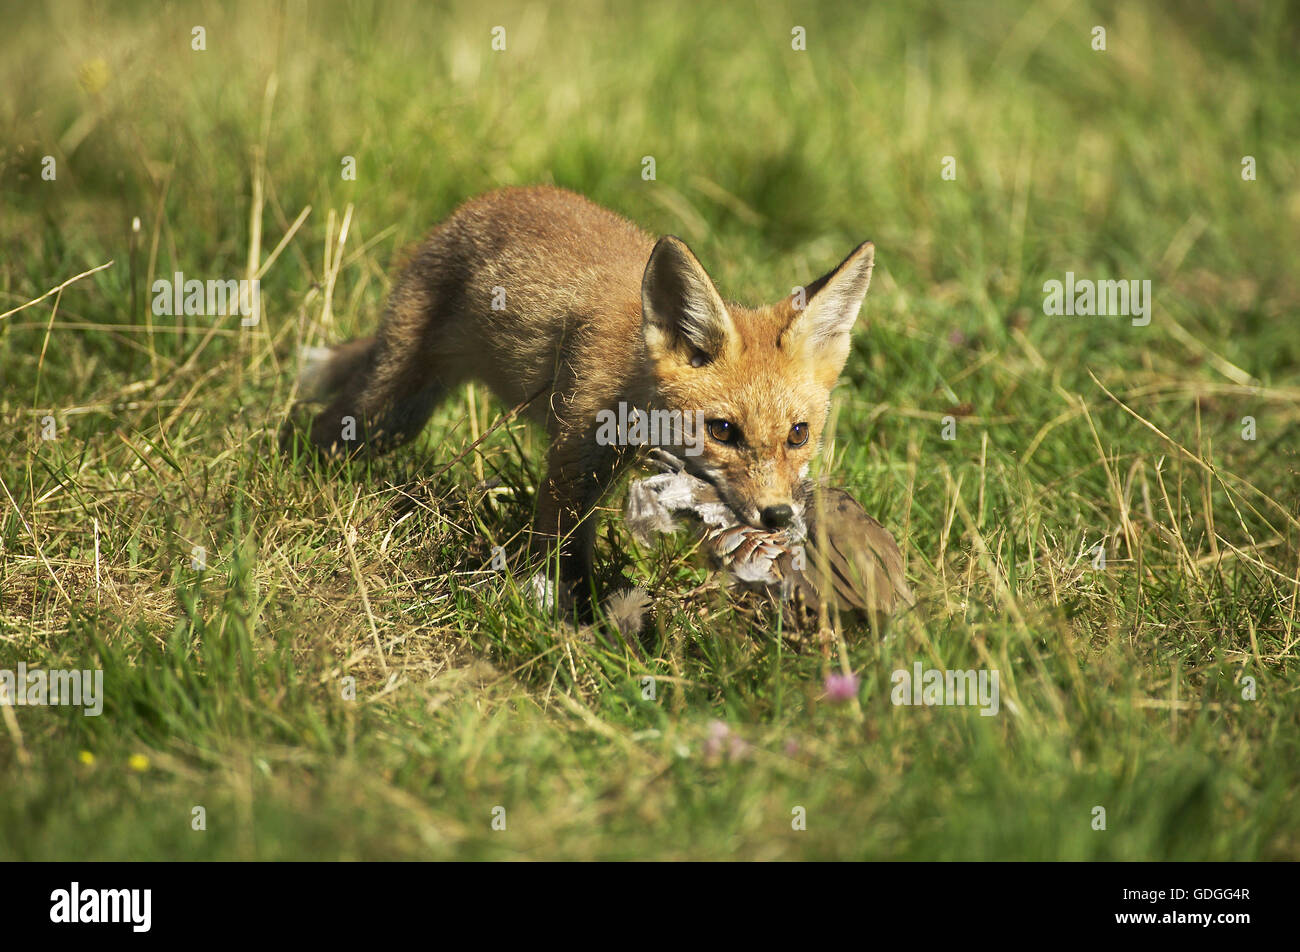 Red Fox, vulpes vulpes, Cub killing a Partridge, Normandy - Stock Image